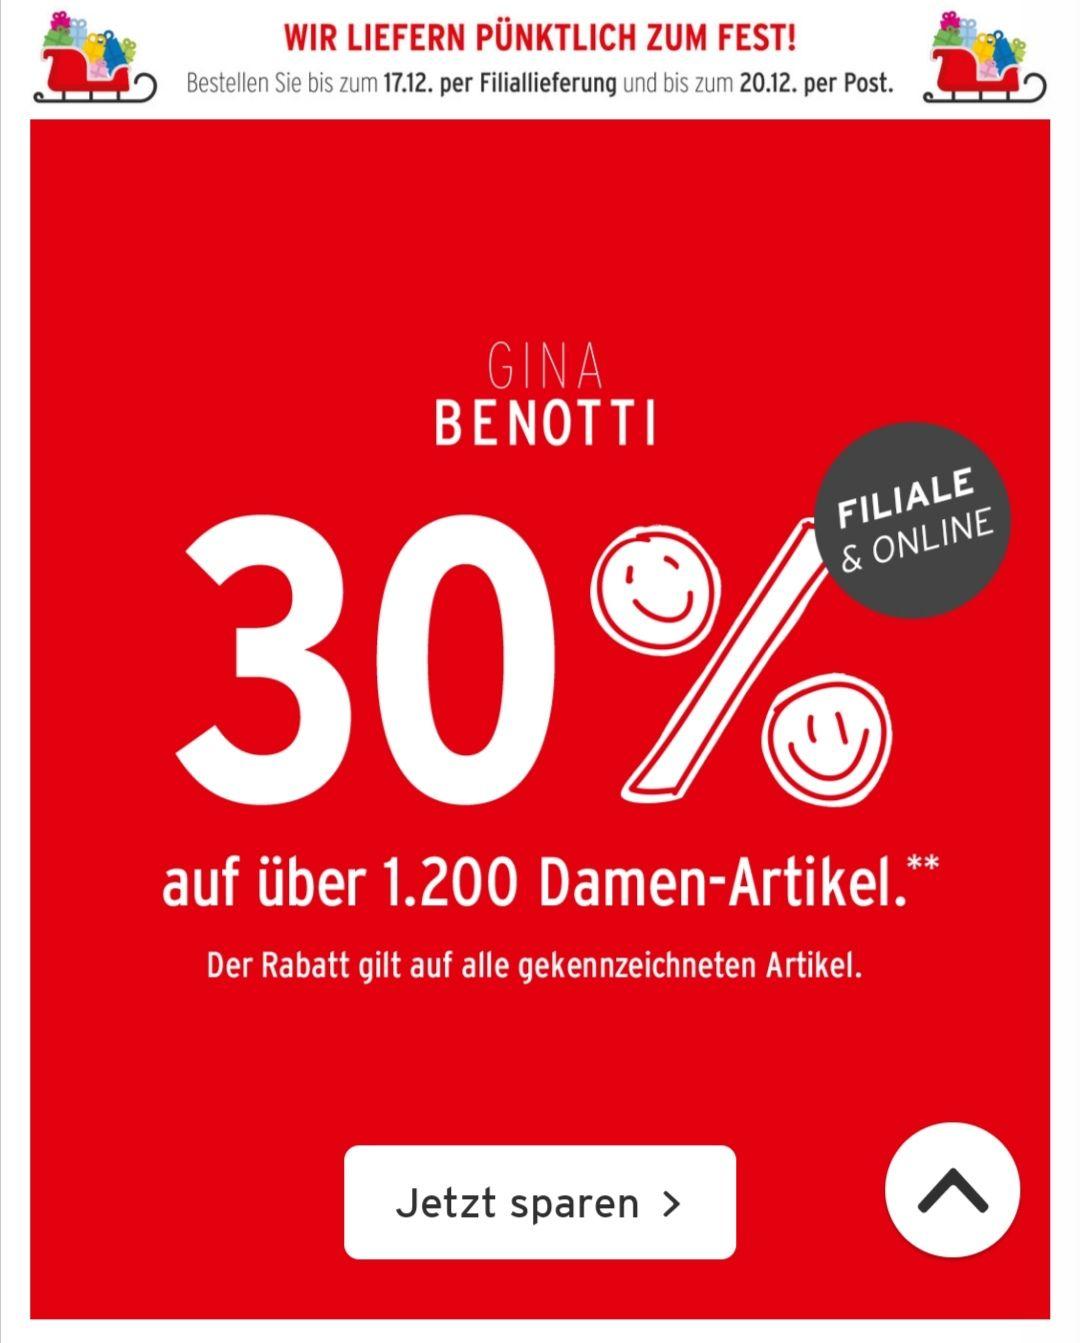 Ernsting's Family - 30% auf Damenbekleidung Marke Gina Benotti